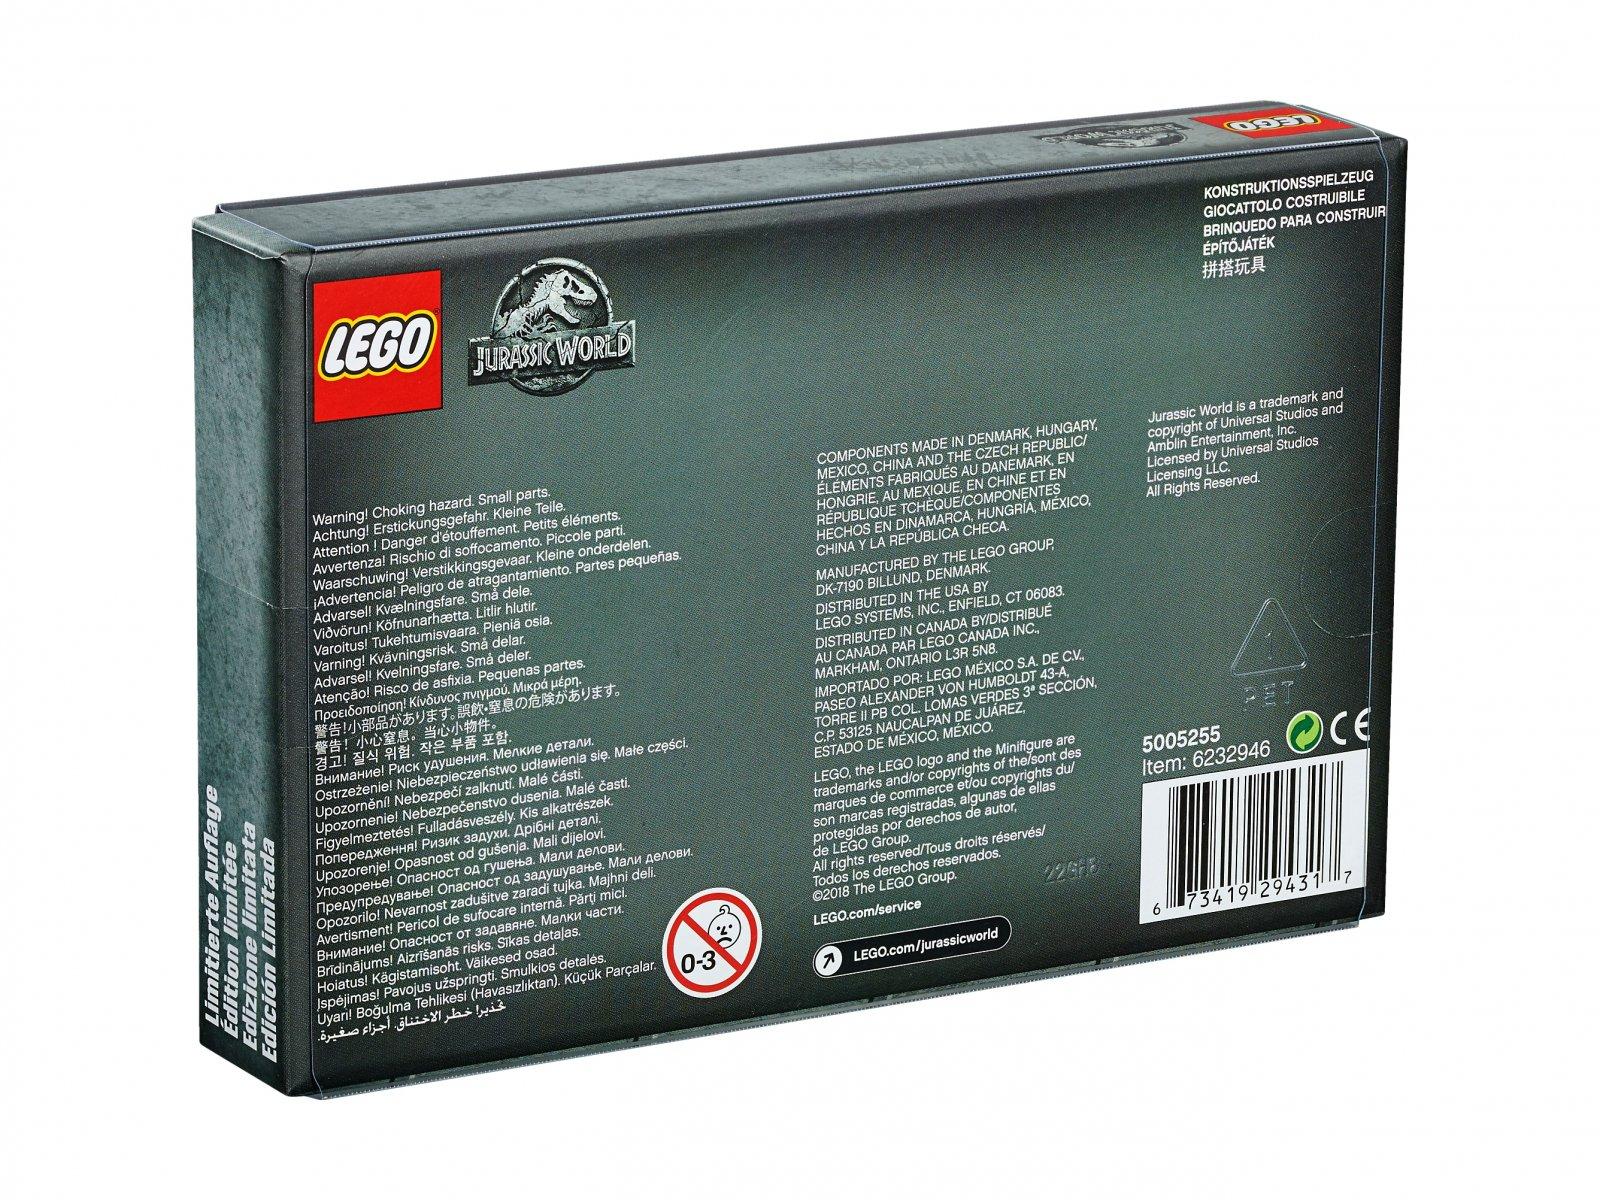 LEGO Jurassic World™ Bricktober Jurassic World™ 5005255